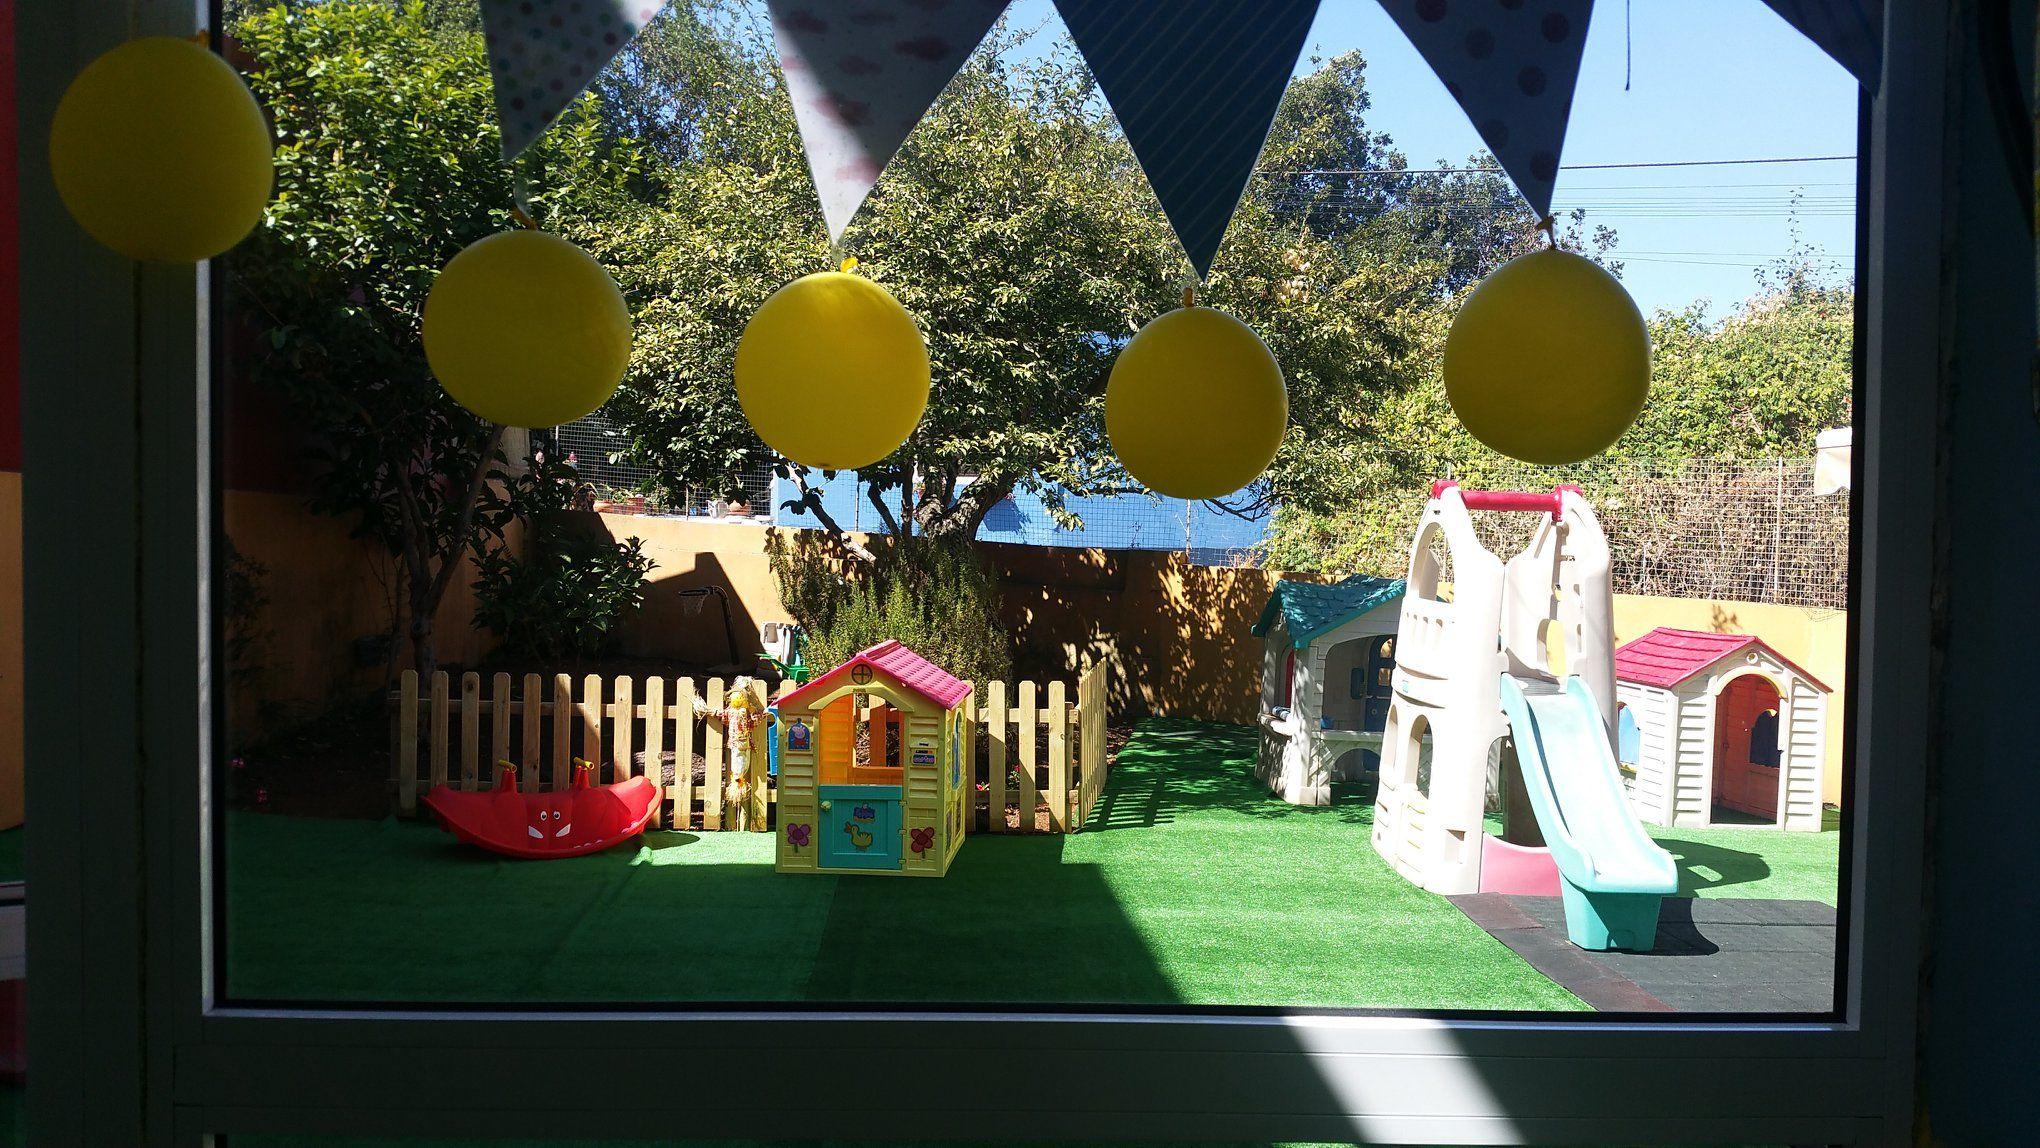 Escuela infantil en Tenerife norte